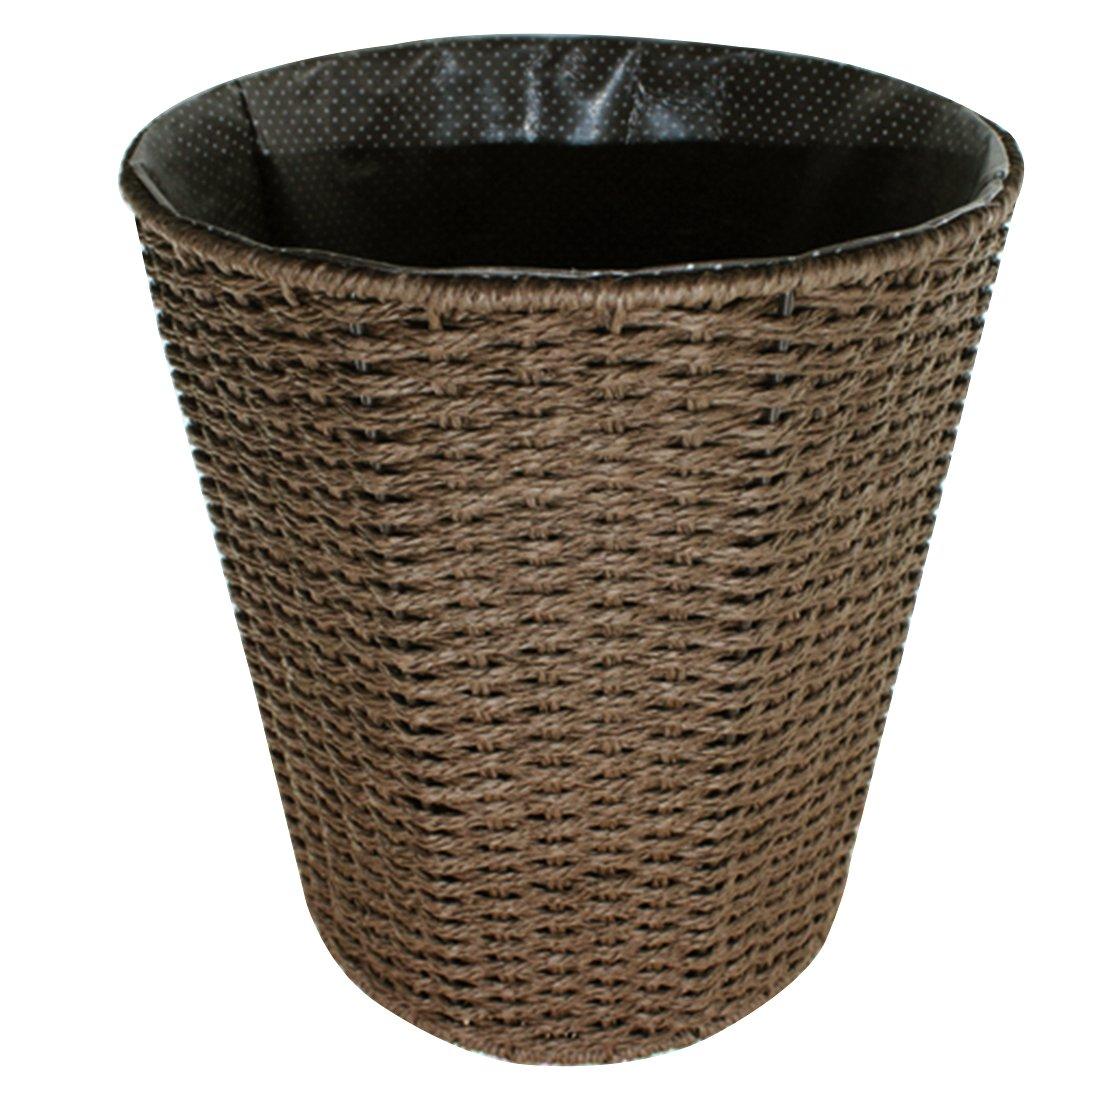 Paper Wastebasket Fcoson Rattan Woven Storage Baskets Decorative Round Trash can for Bedroom Desktop Coffee